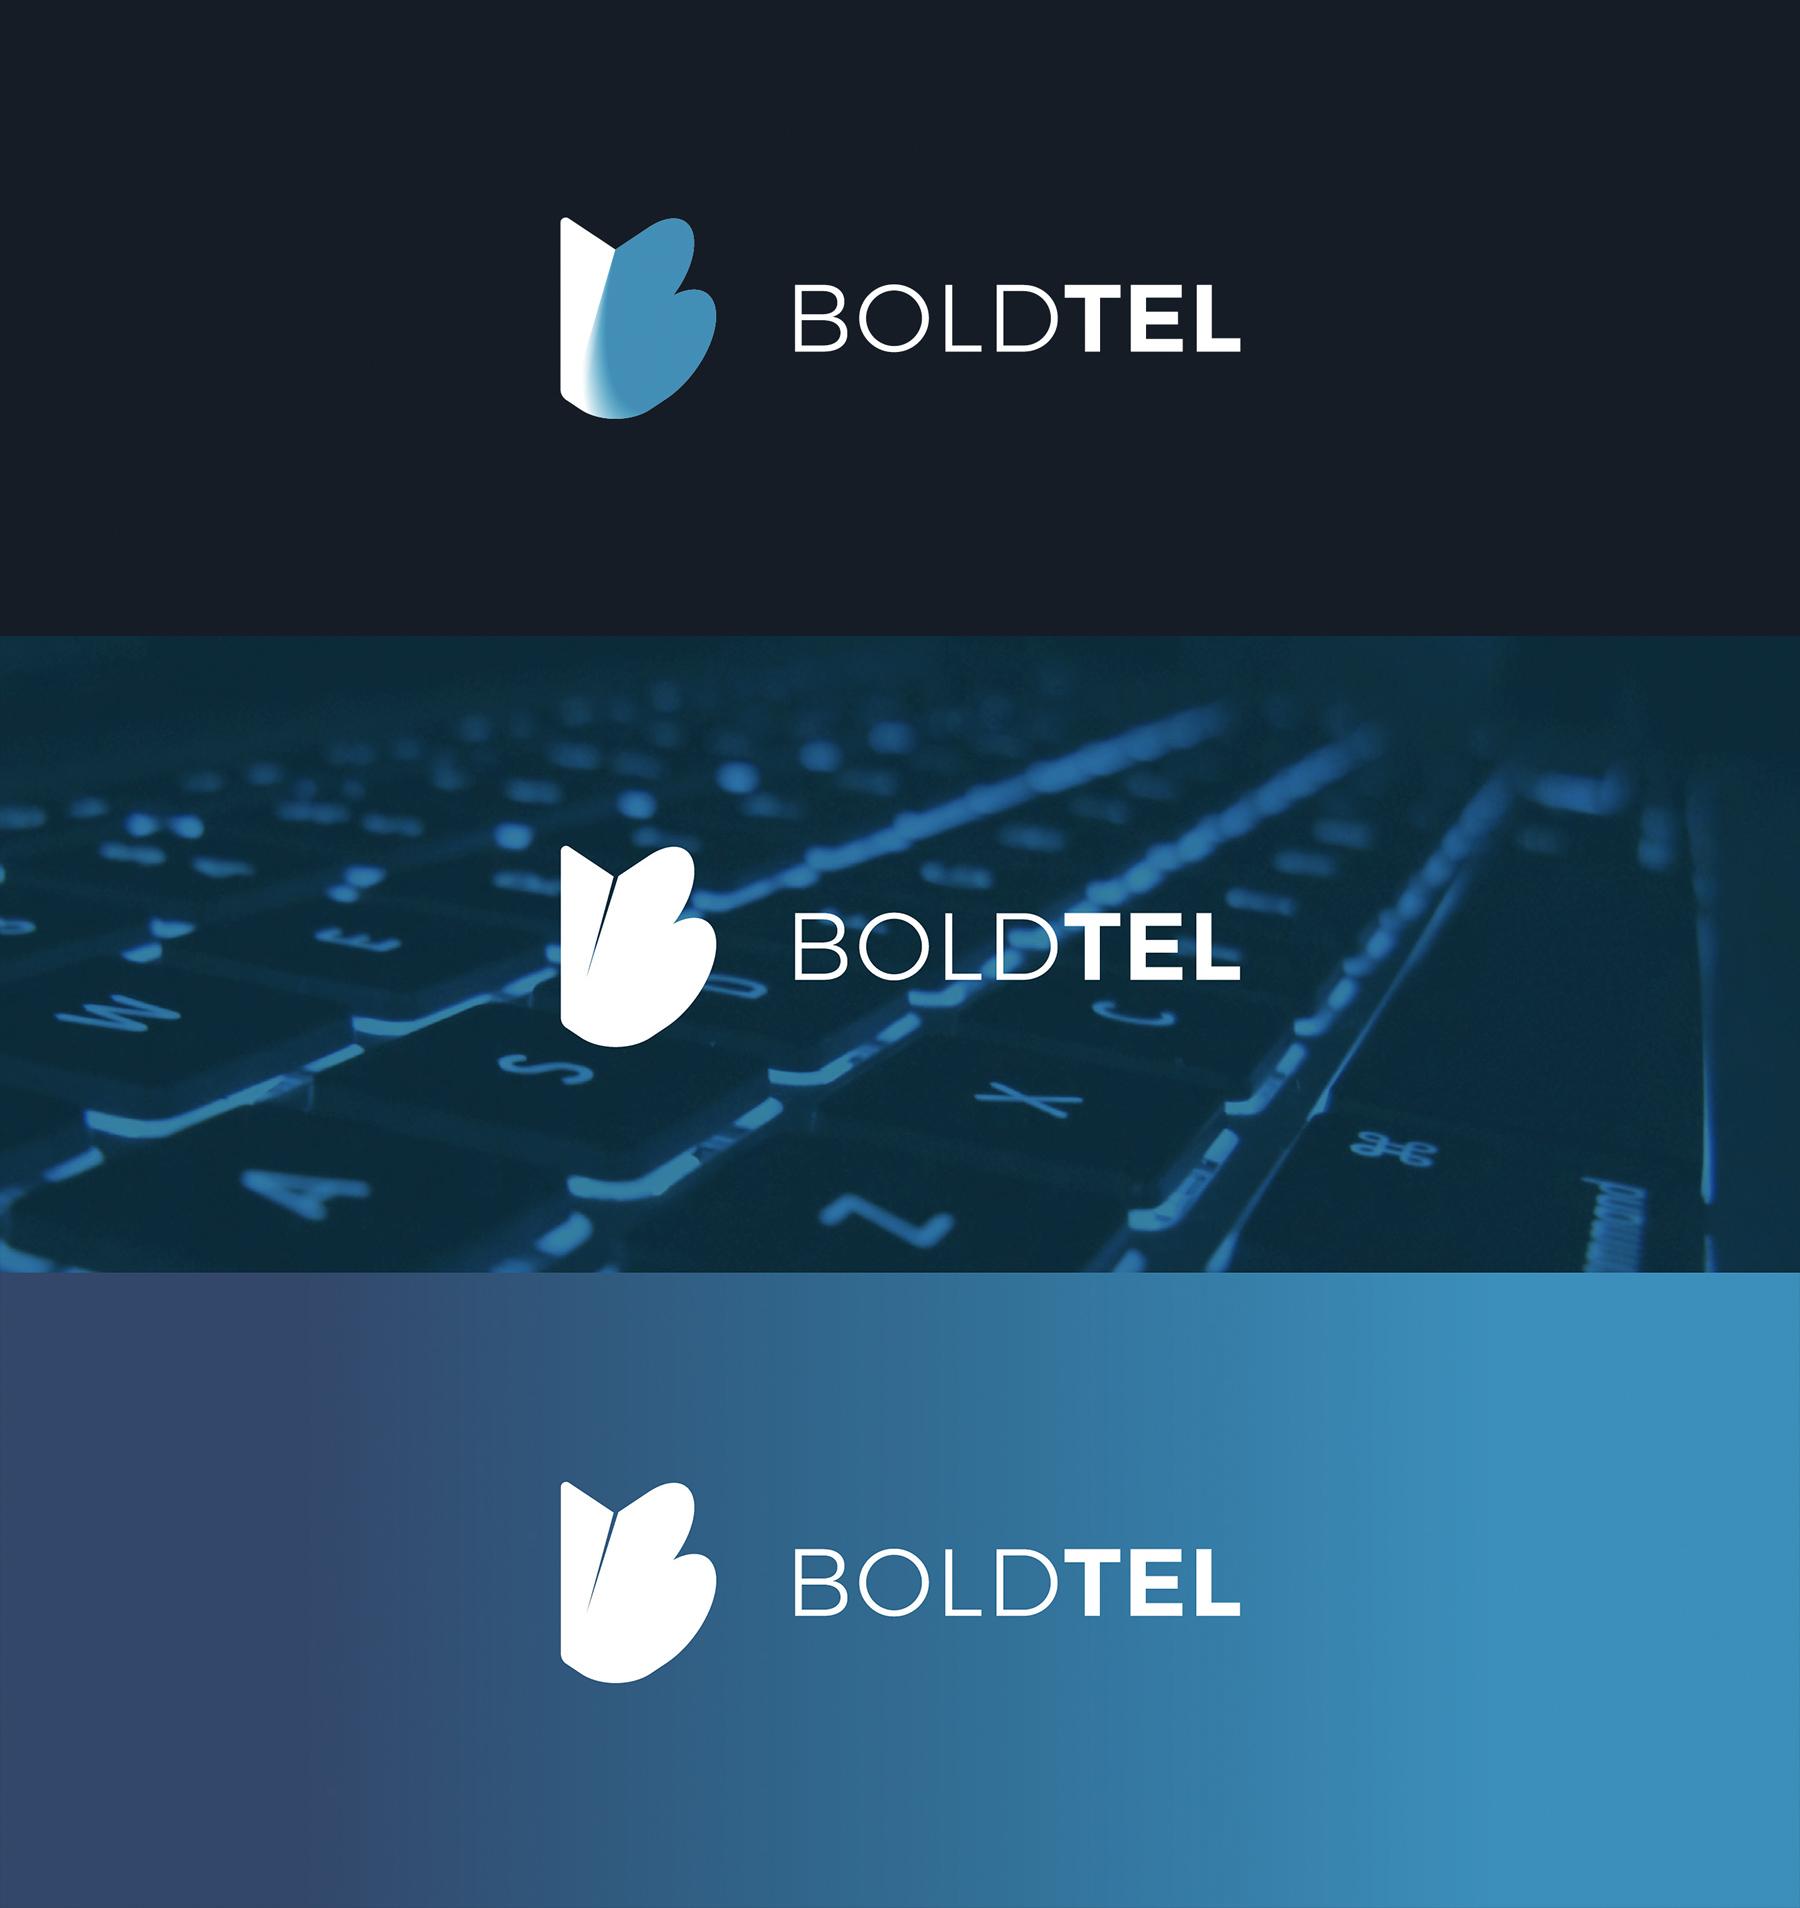 boldtel_gal_10.jpg